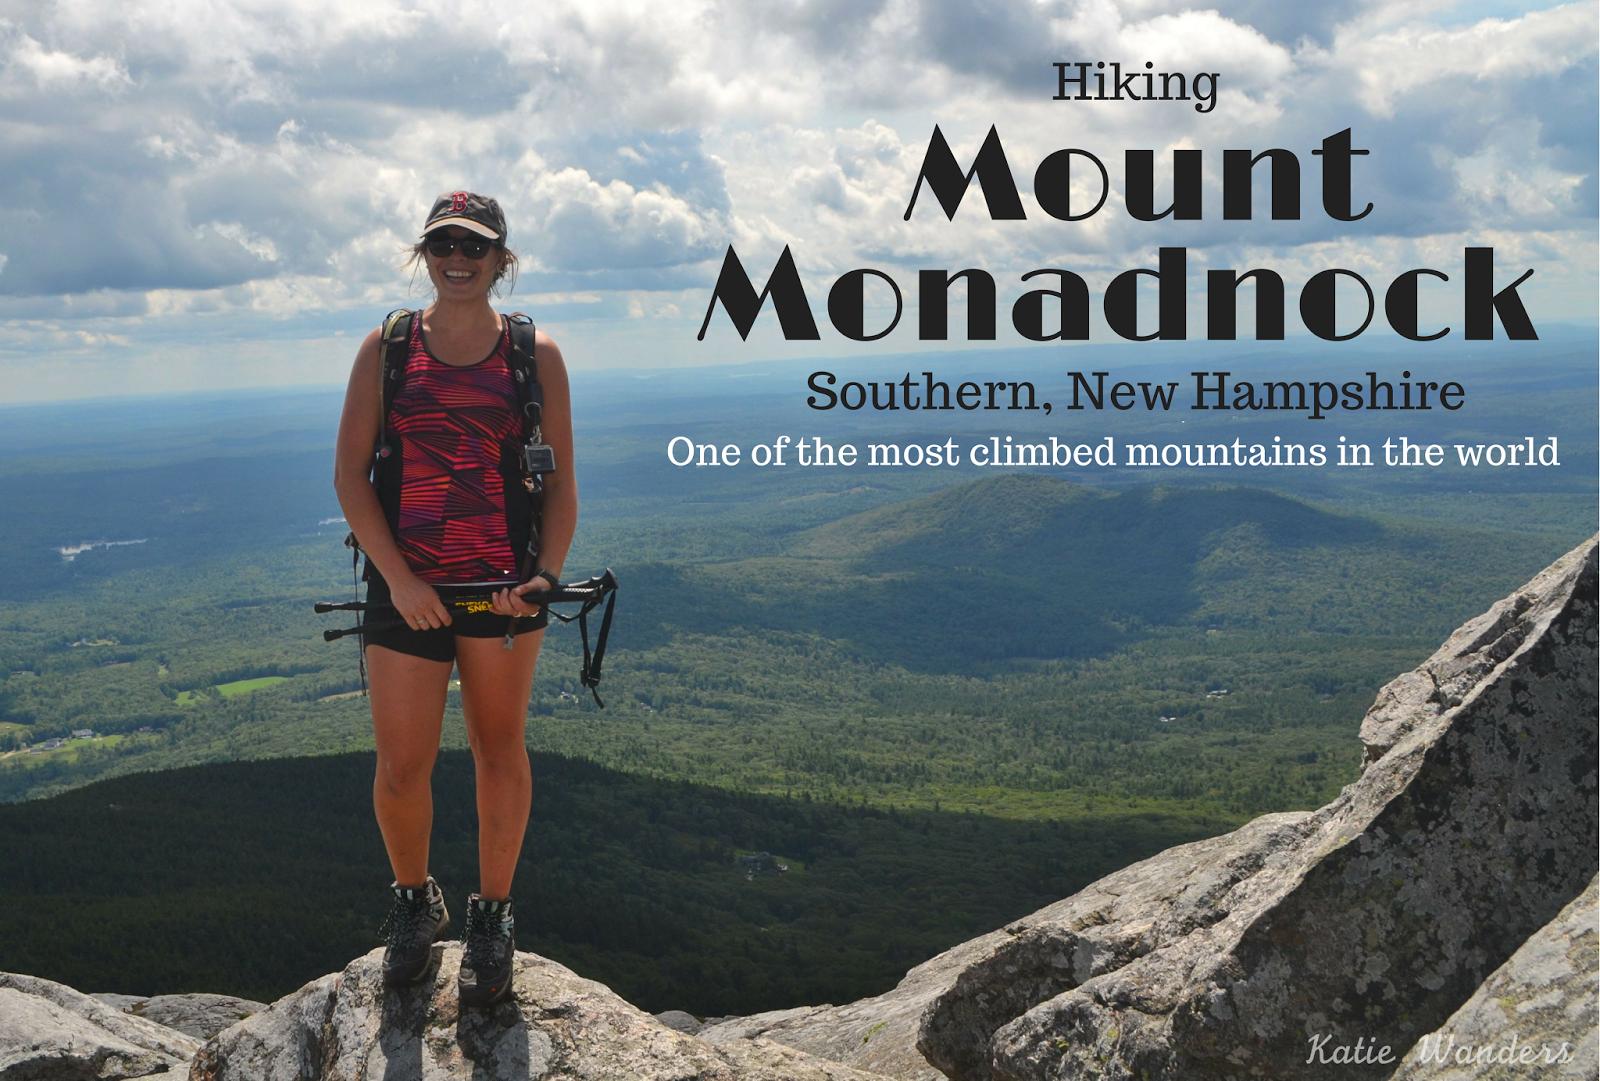 katie wanders hiking mount monadnock southern new hampshire